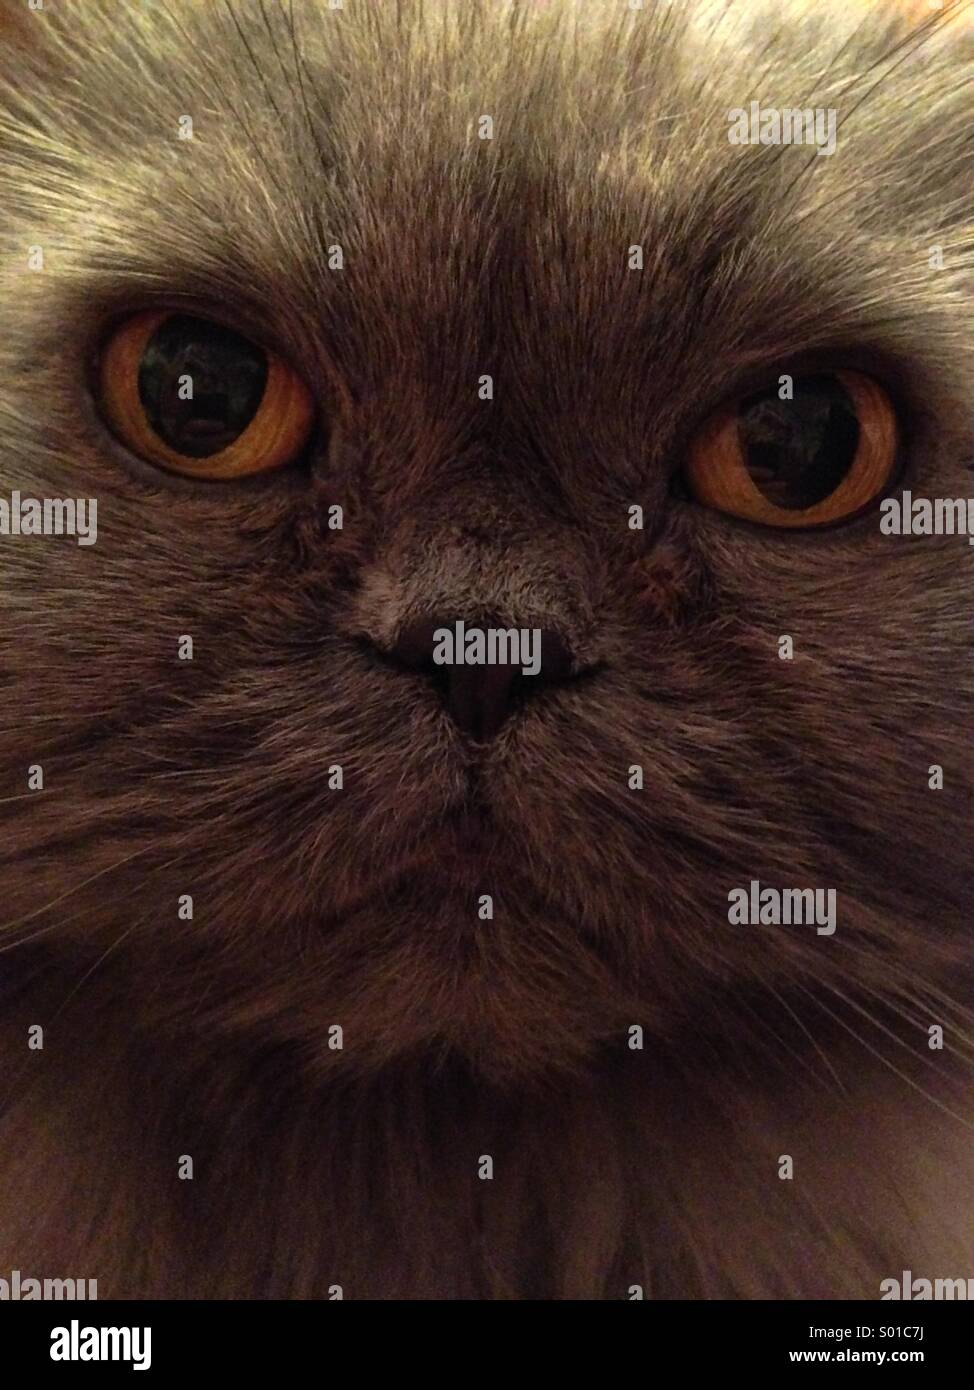 Persian cat - Stock Image